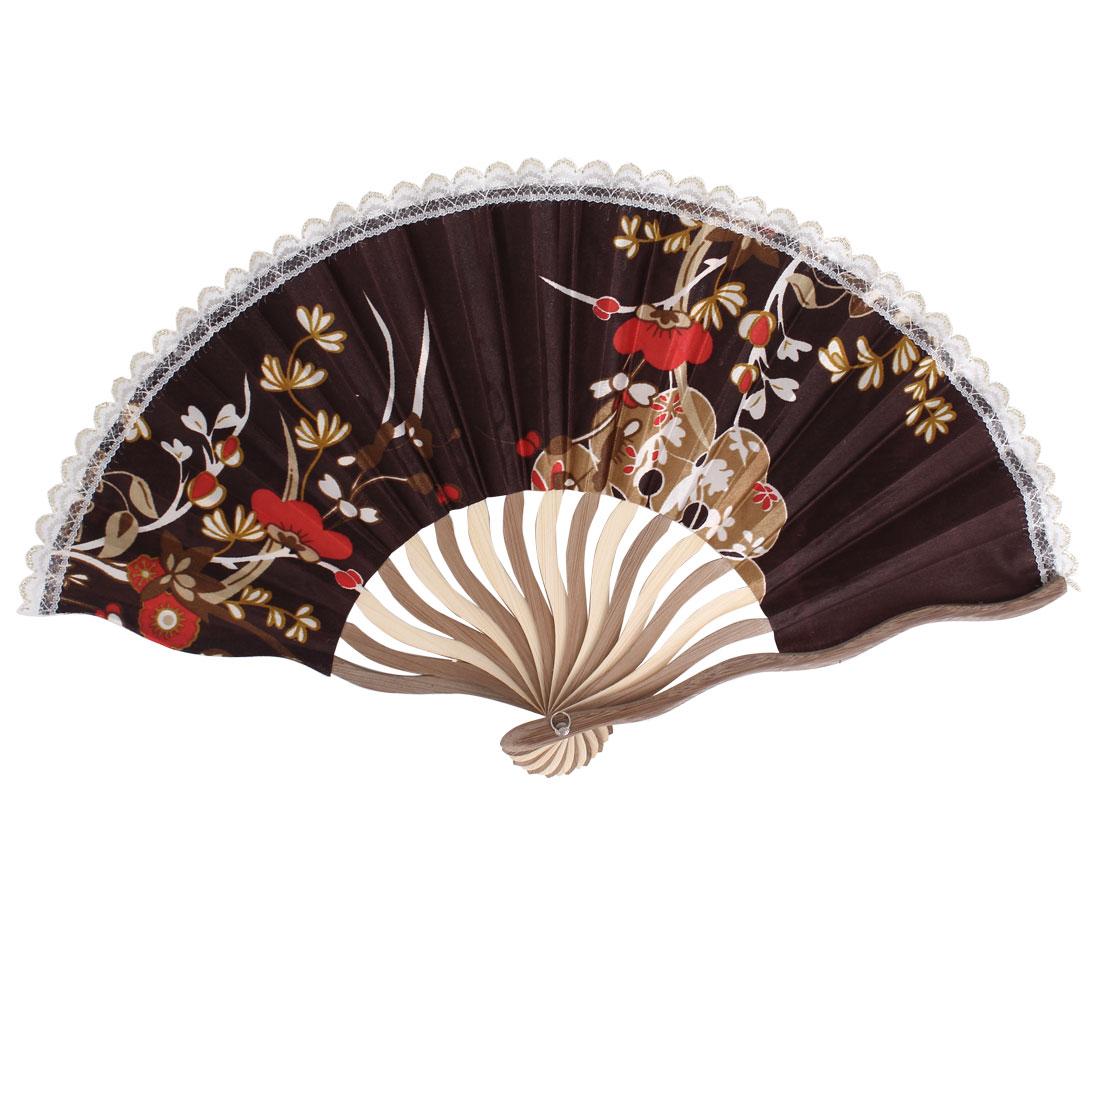 Wood Frame Flowers Pattern Lace Rim Dancing Party Folding Hand Fan Brown